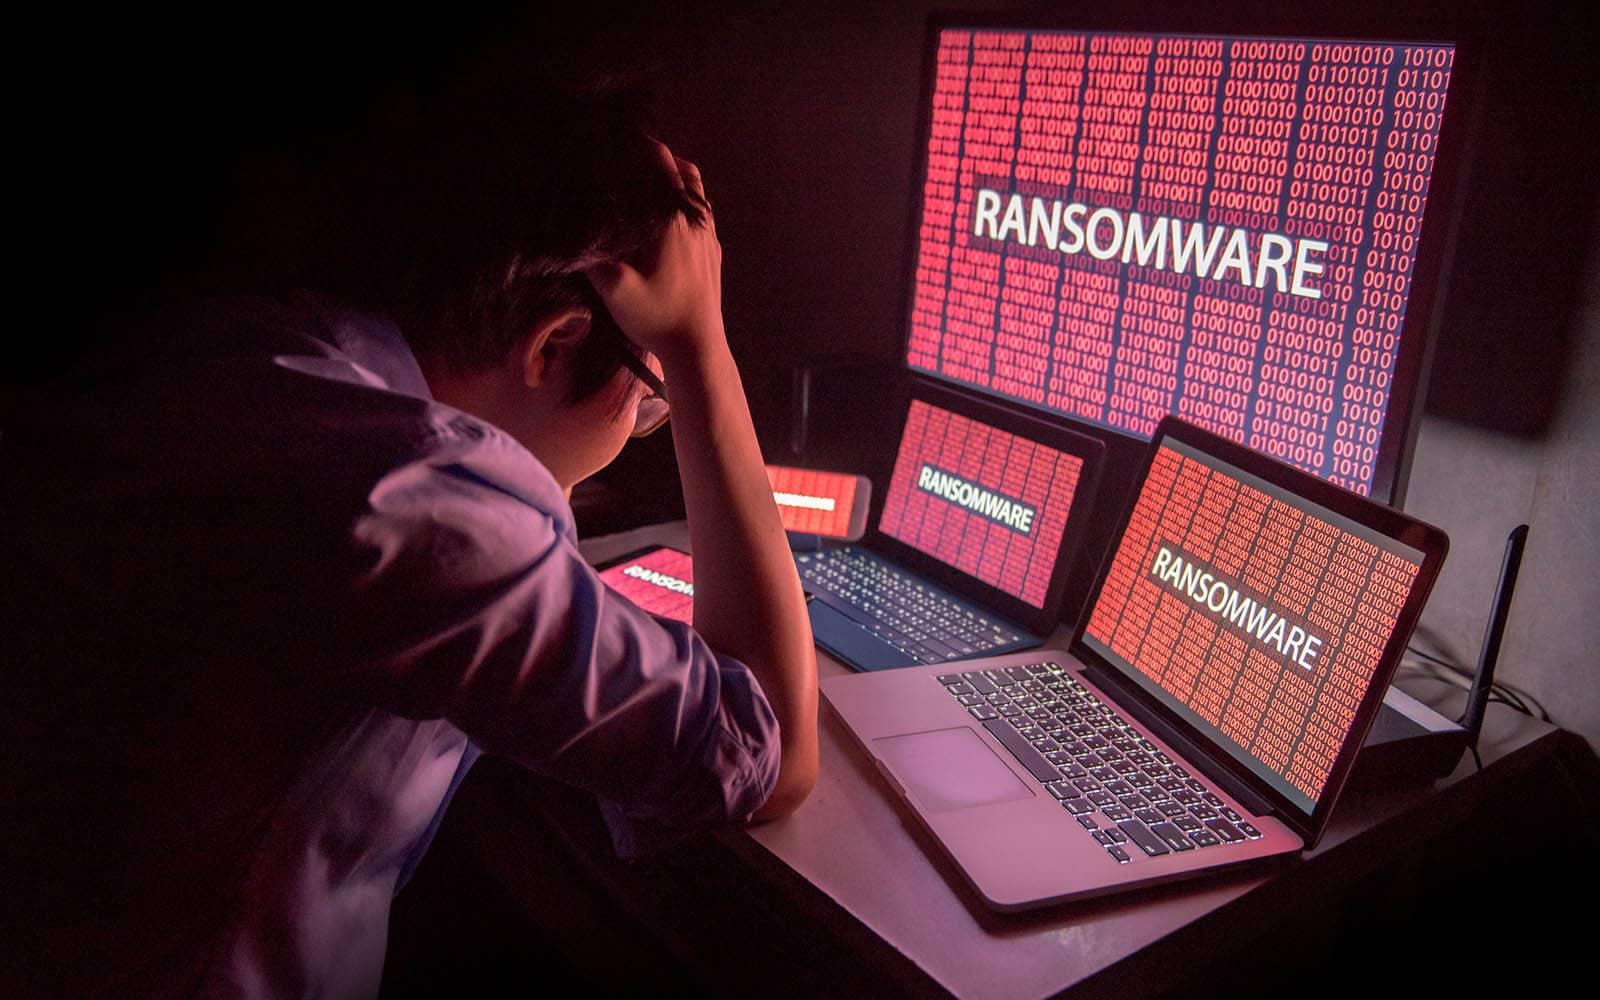 Ransomware, Ransomware attacks, Kroll, Bitcoin, Healthcare